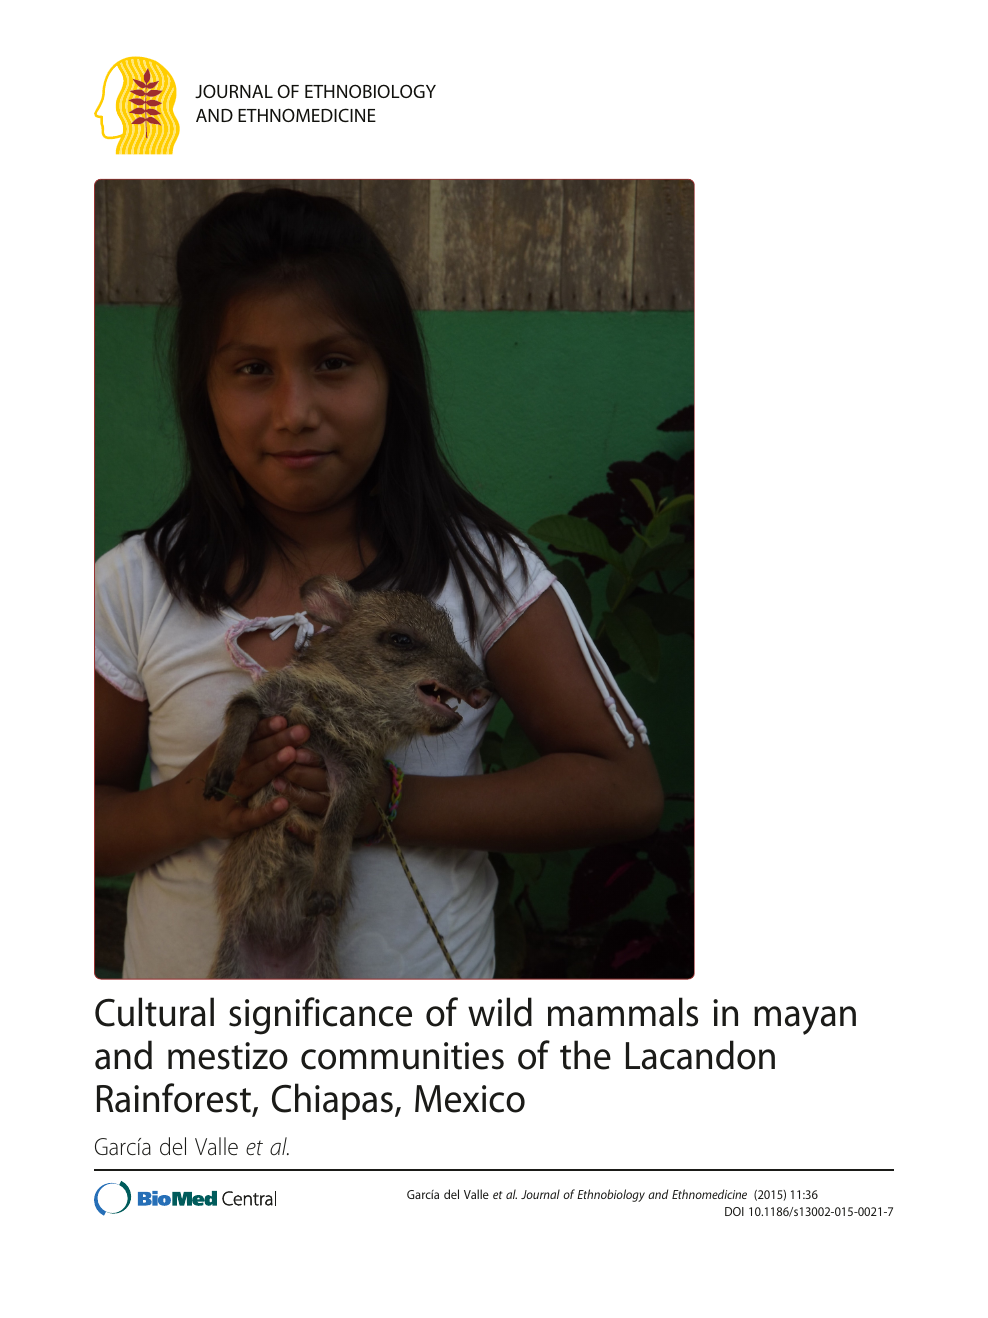 Ana Maria Rios Desnuda cultural significance of wild mammals in mayan and mestizo